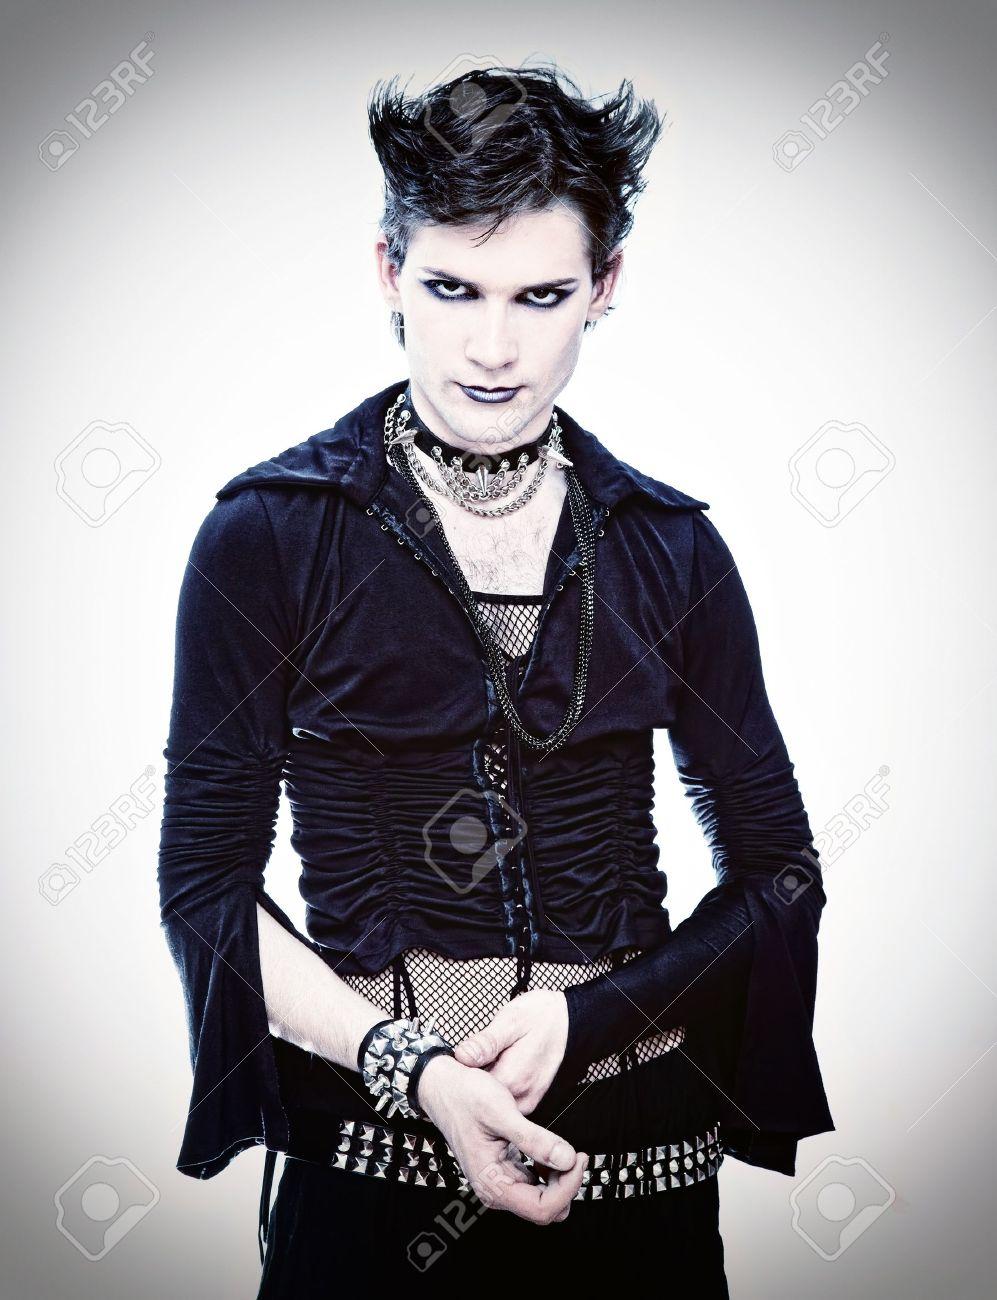 goth-style man in black dress Stock Photo - 16167158